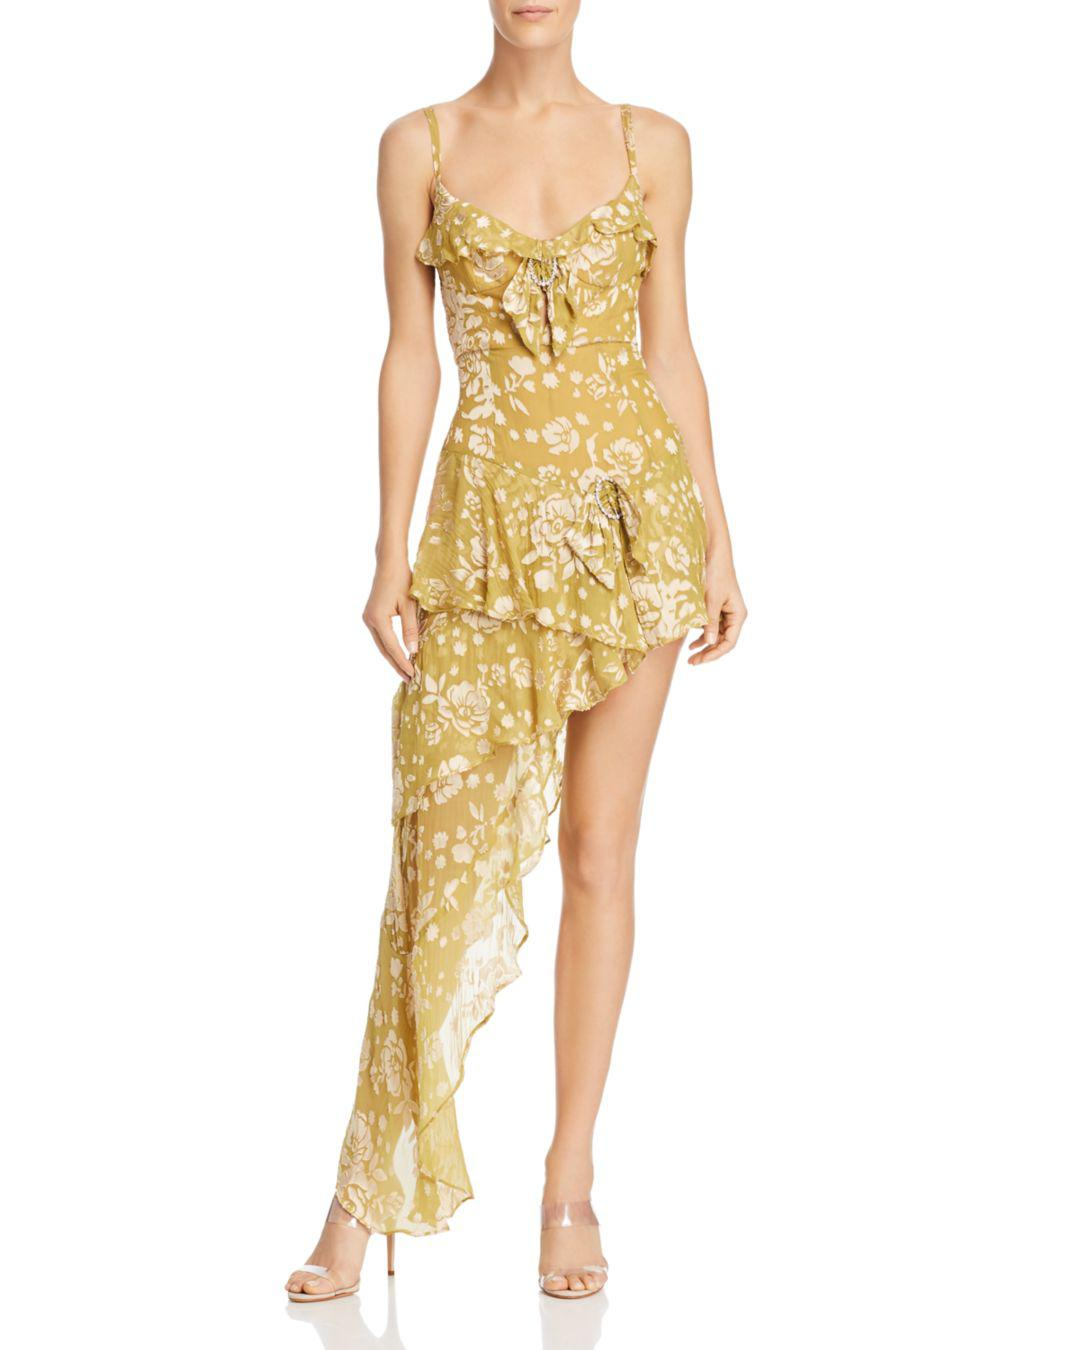 866fd5278d23 Lyst - For Love   Lemons Cosmo Asymmetric Mini Dress in Yellow